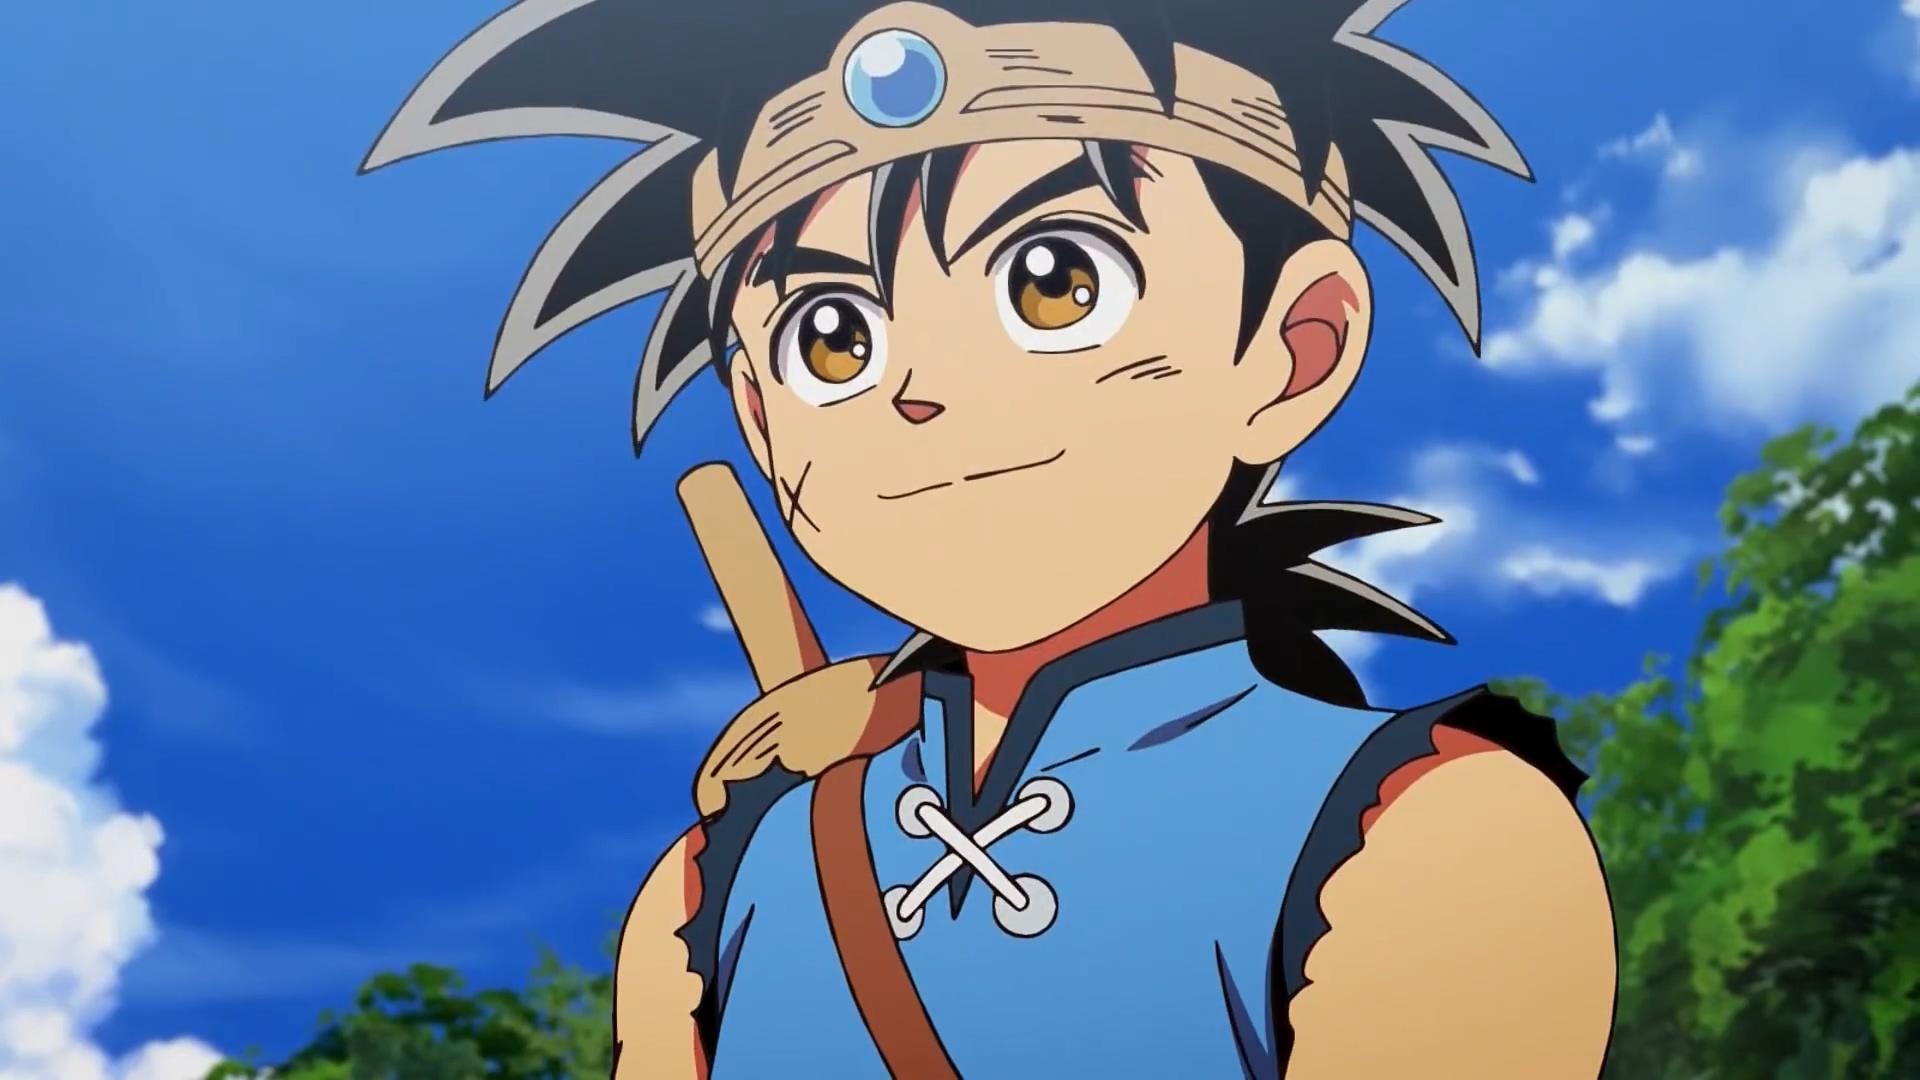 Australia: Square Enix has trademarked Infinity Strash – Dragon Quest: The Adventure of Dai